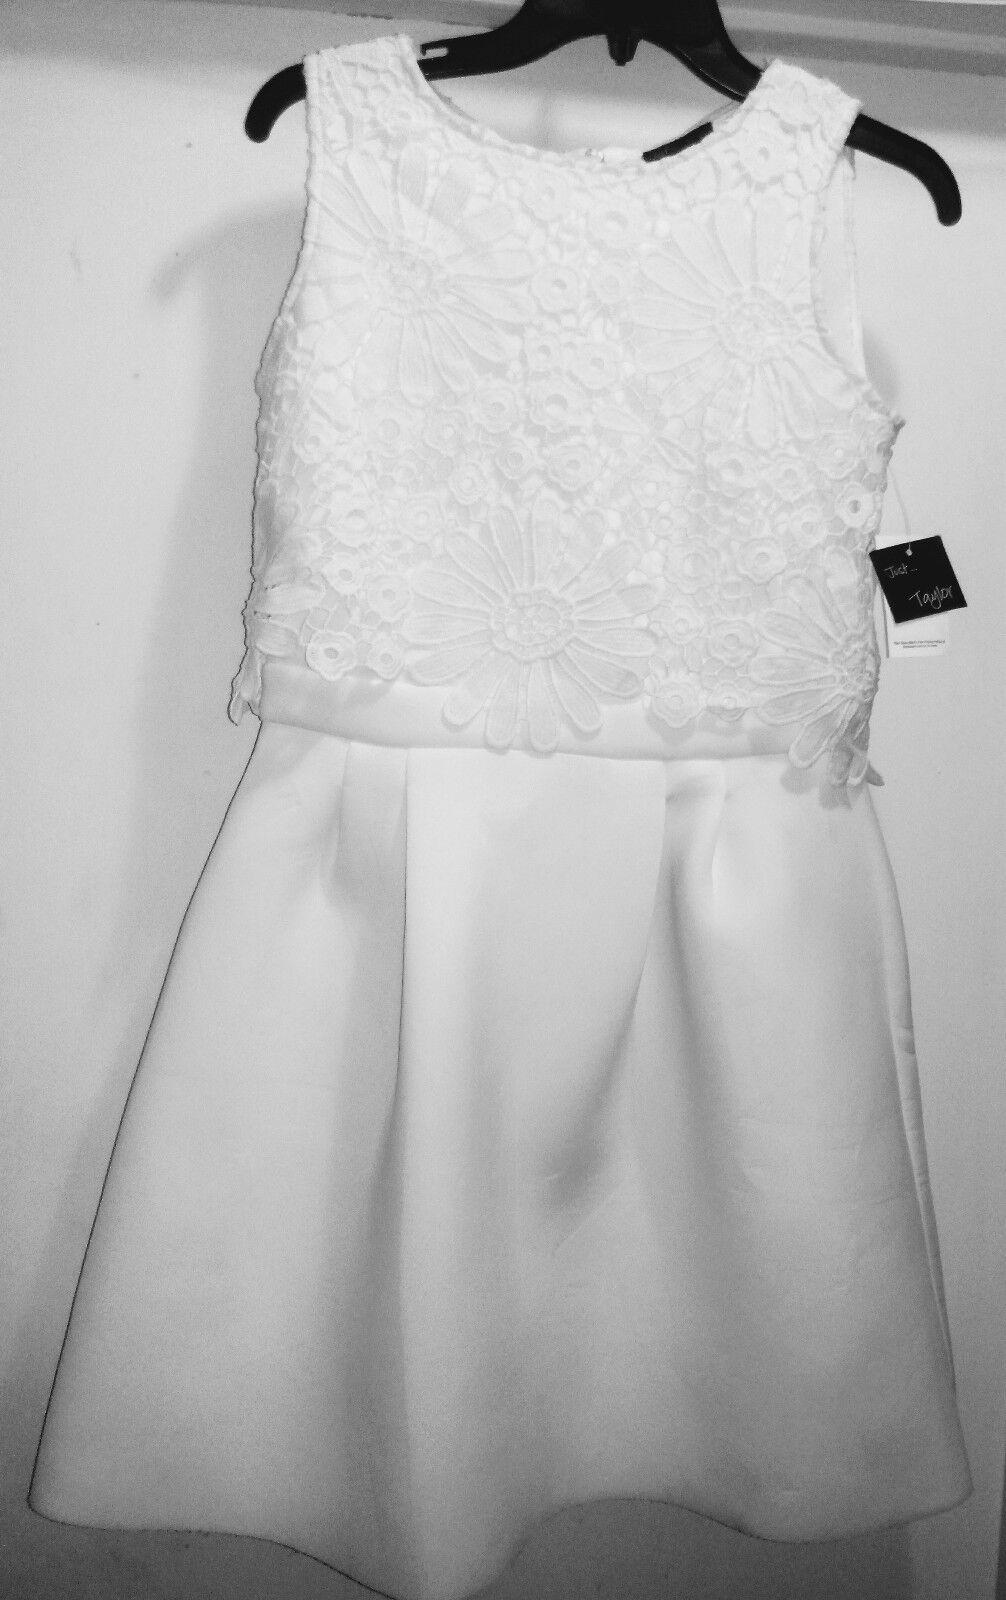 Just Taylor White Scuba Dress Size 8